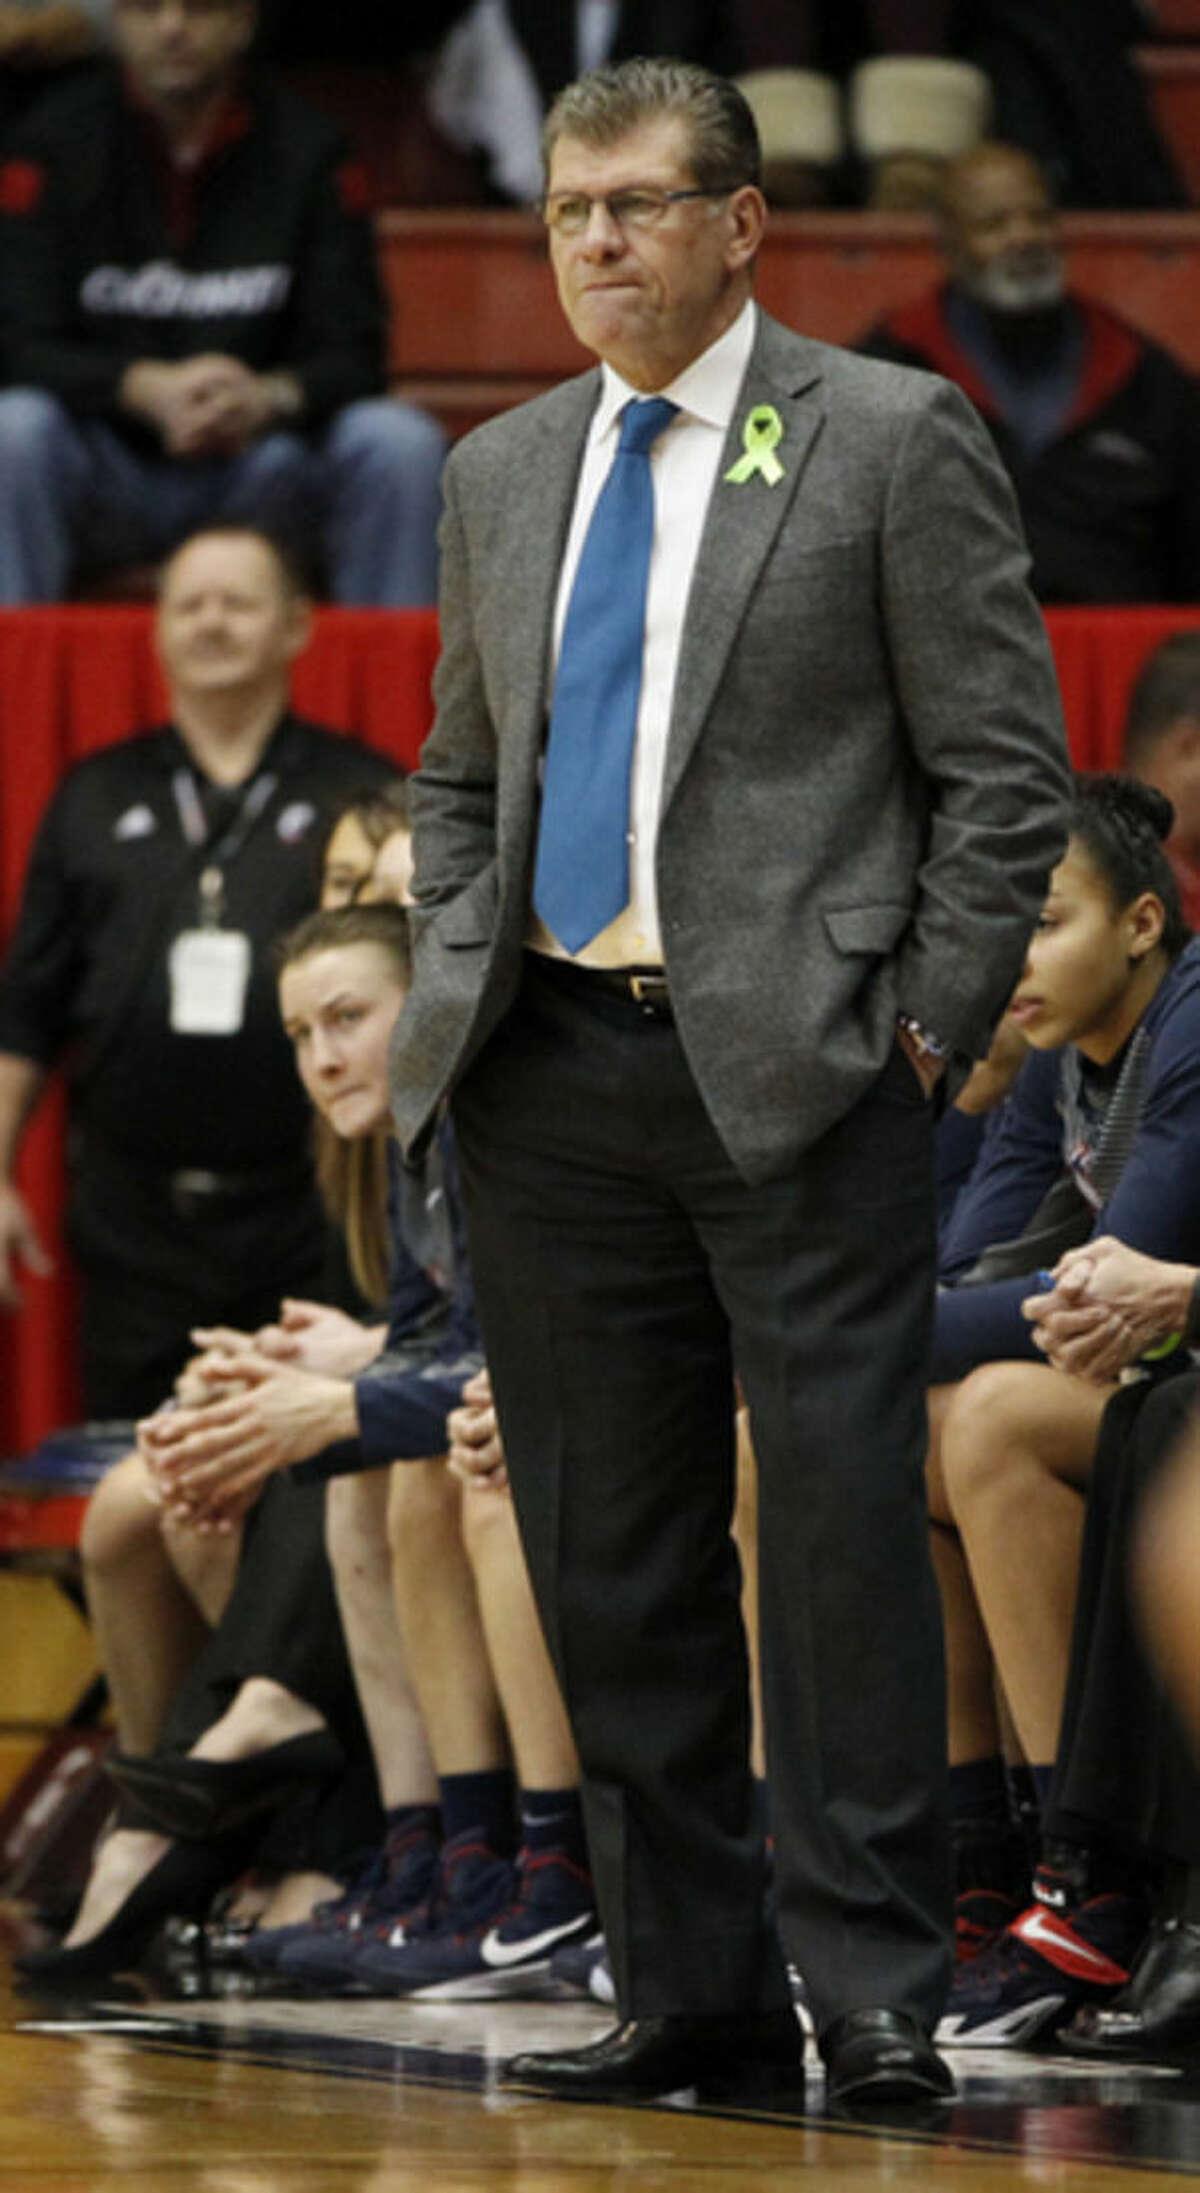 Connecticut head coach Geno Auriemma watches his team against Cincinnati during the first half of their NCAA college basketball game, Sunday Jan. 25, 2015 in Cincinnati. (AP Photo/Gary Landers)